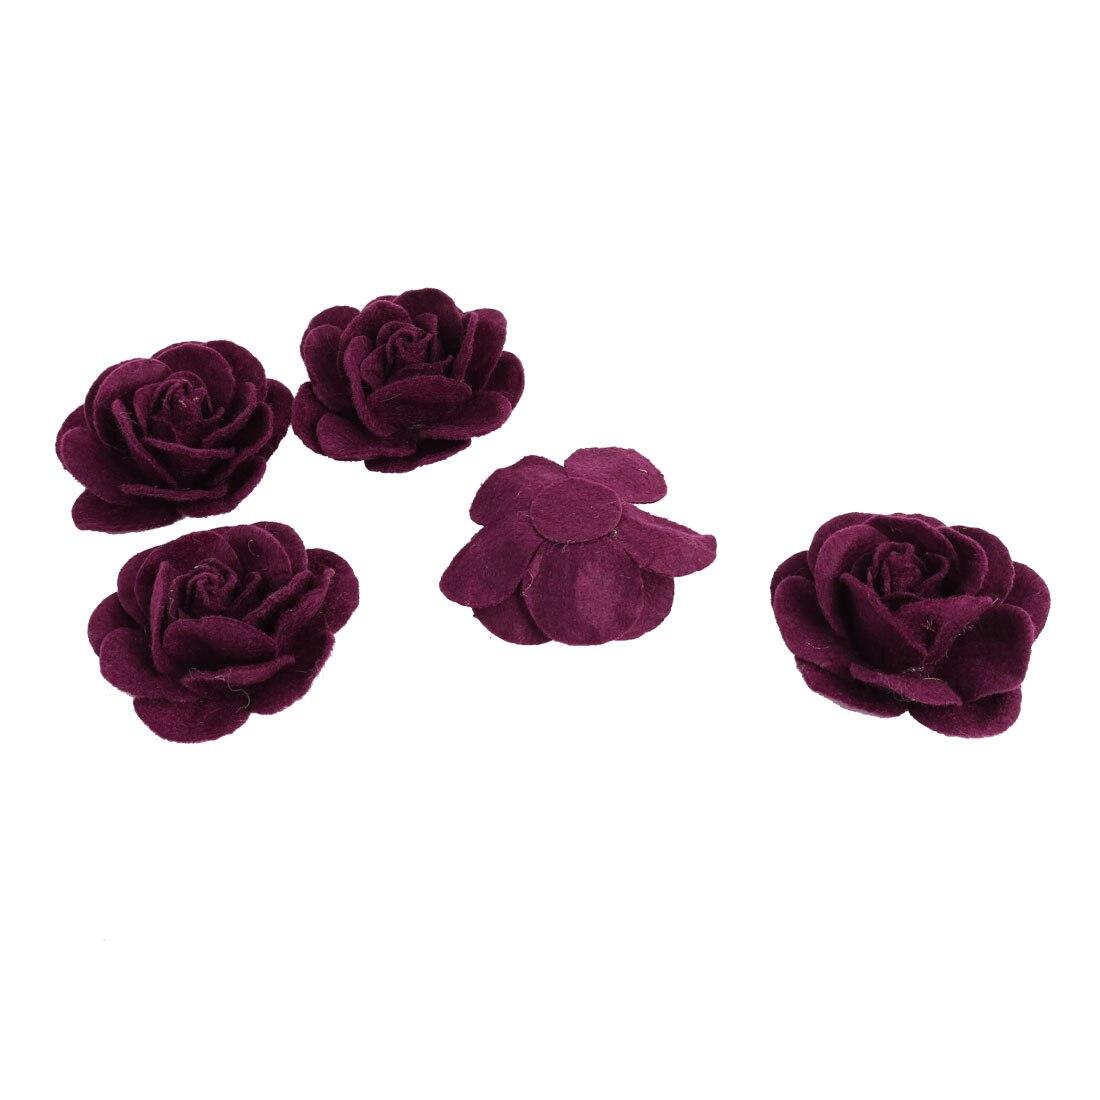 Online Buy Wholesale Purple Kitchen Decor From China: Online Buy Wholesale Dark Purple Roses From China Dark